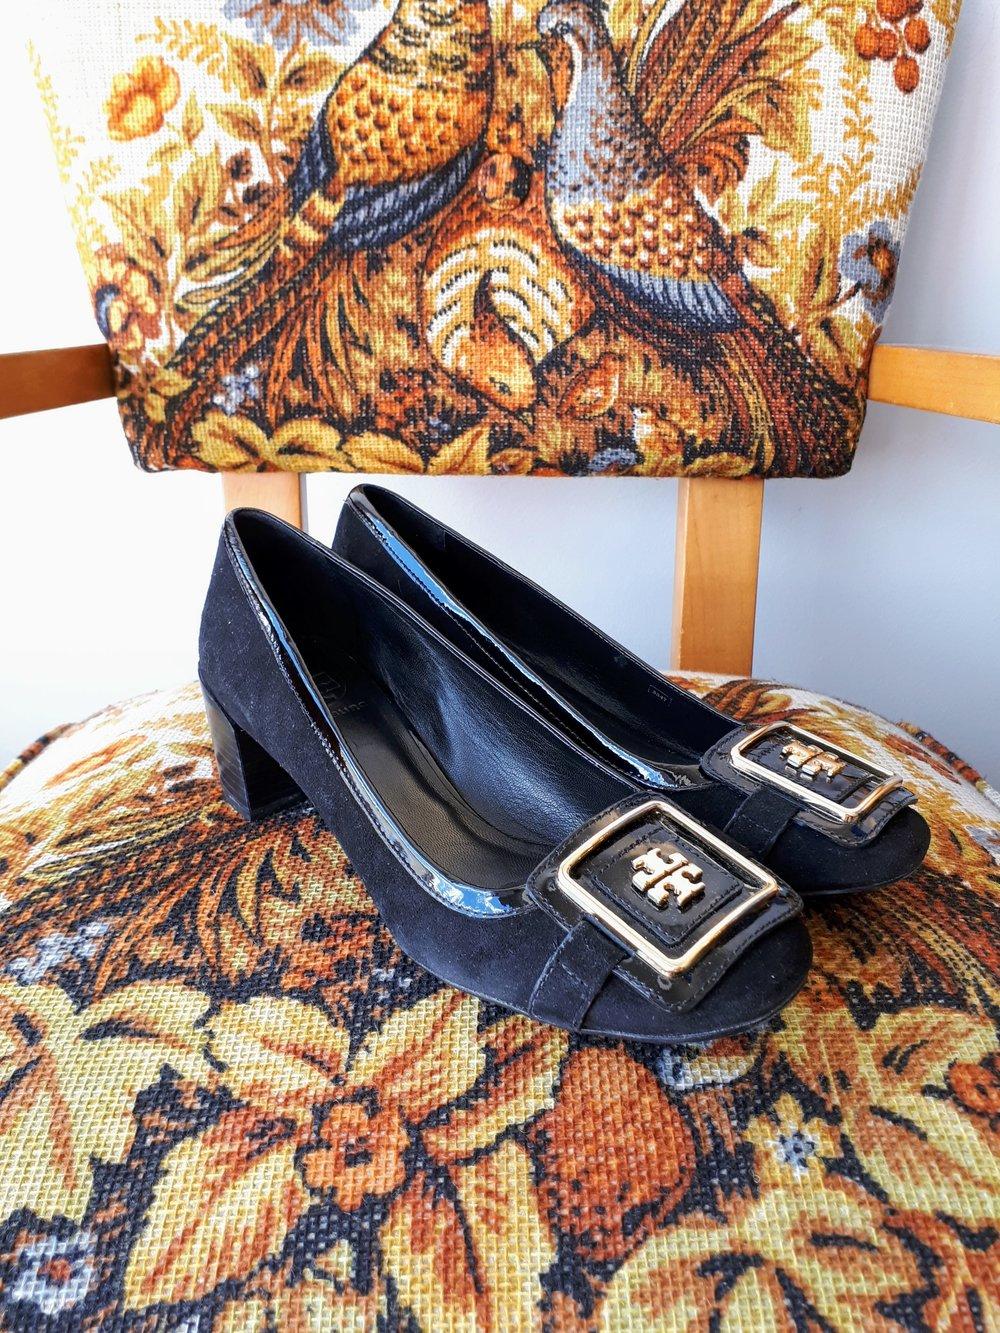 Tory Burch shoes; S 7.5, $58